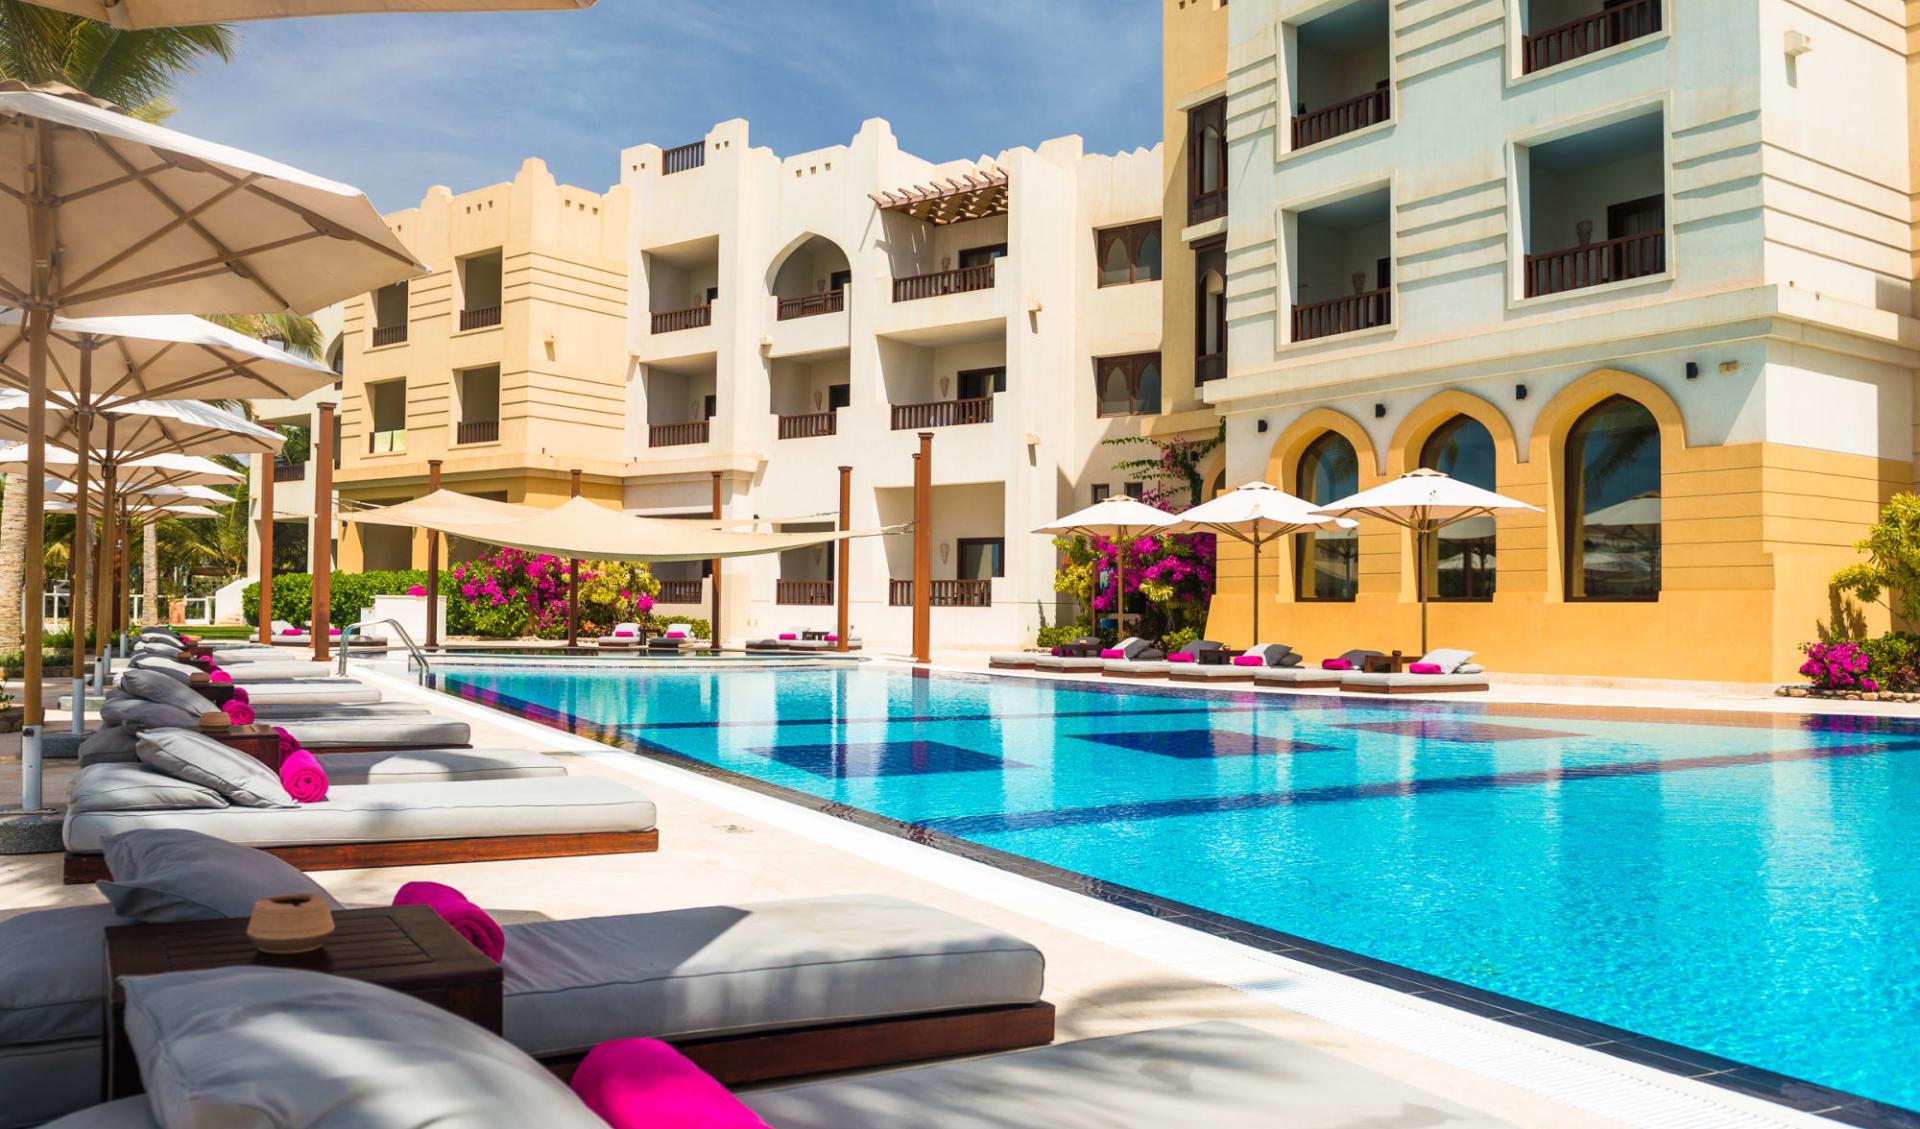 Juweira Boutique Hotel in Salalah: